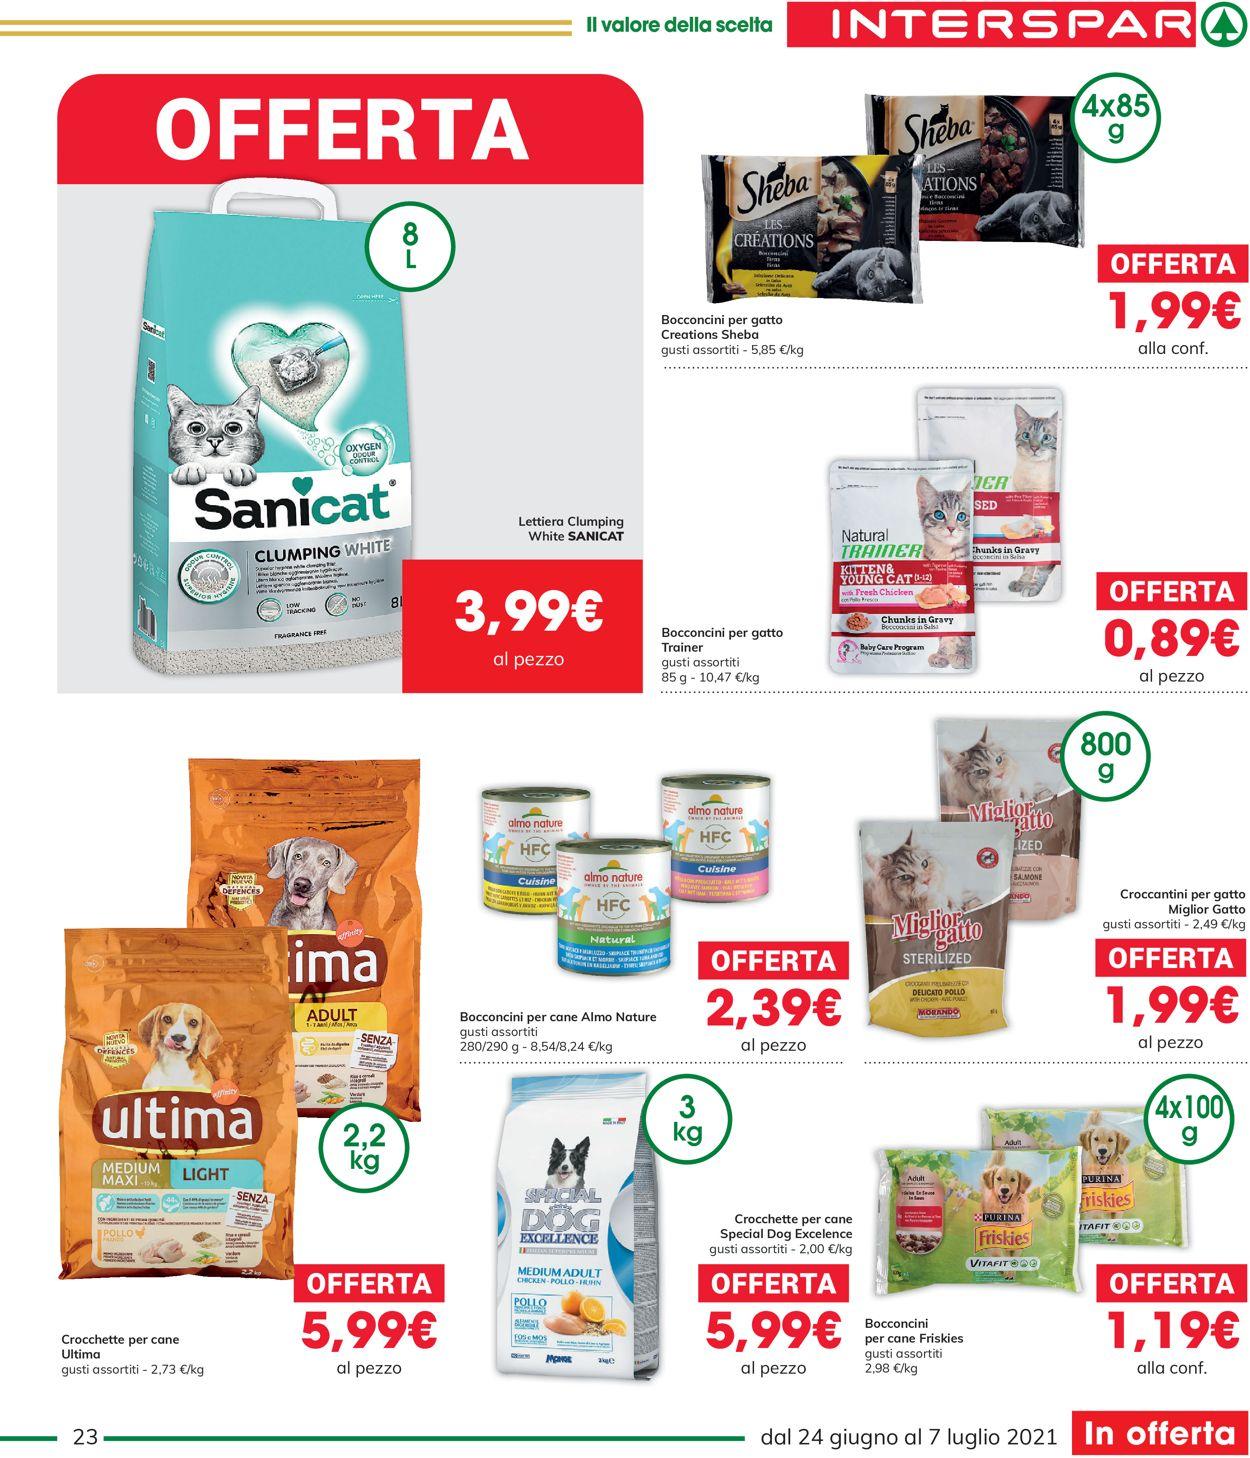 Volantino Interspar - Offerte 24/06-07/07/2021 (Pagina 23)